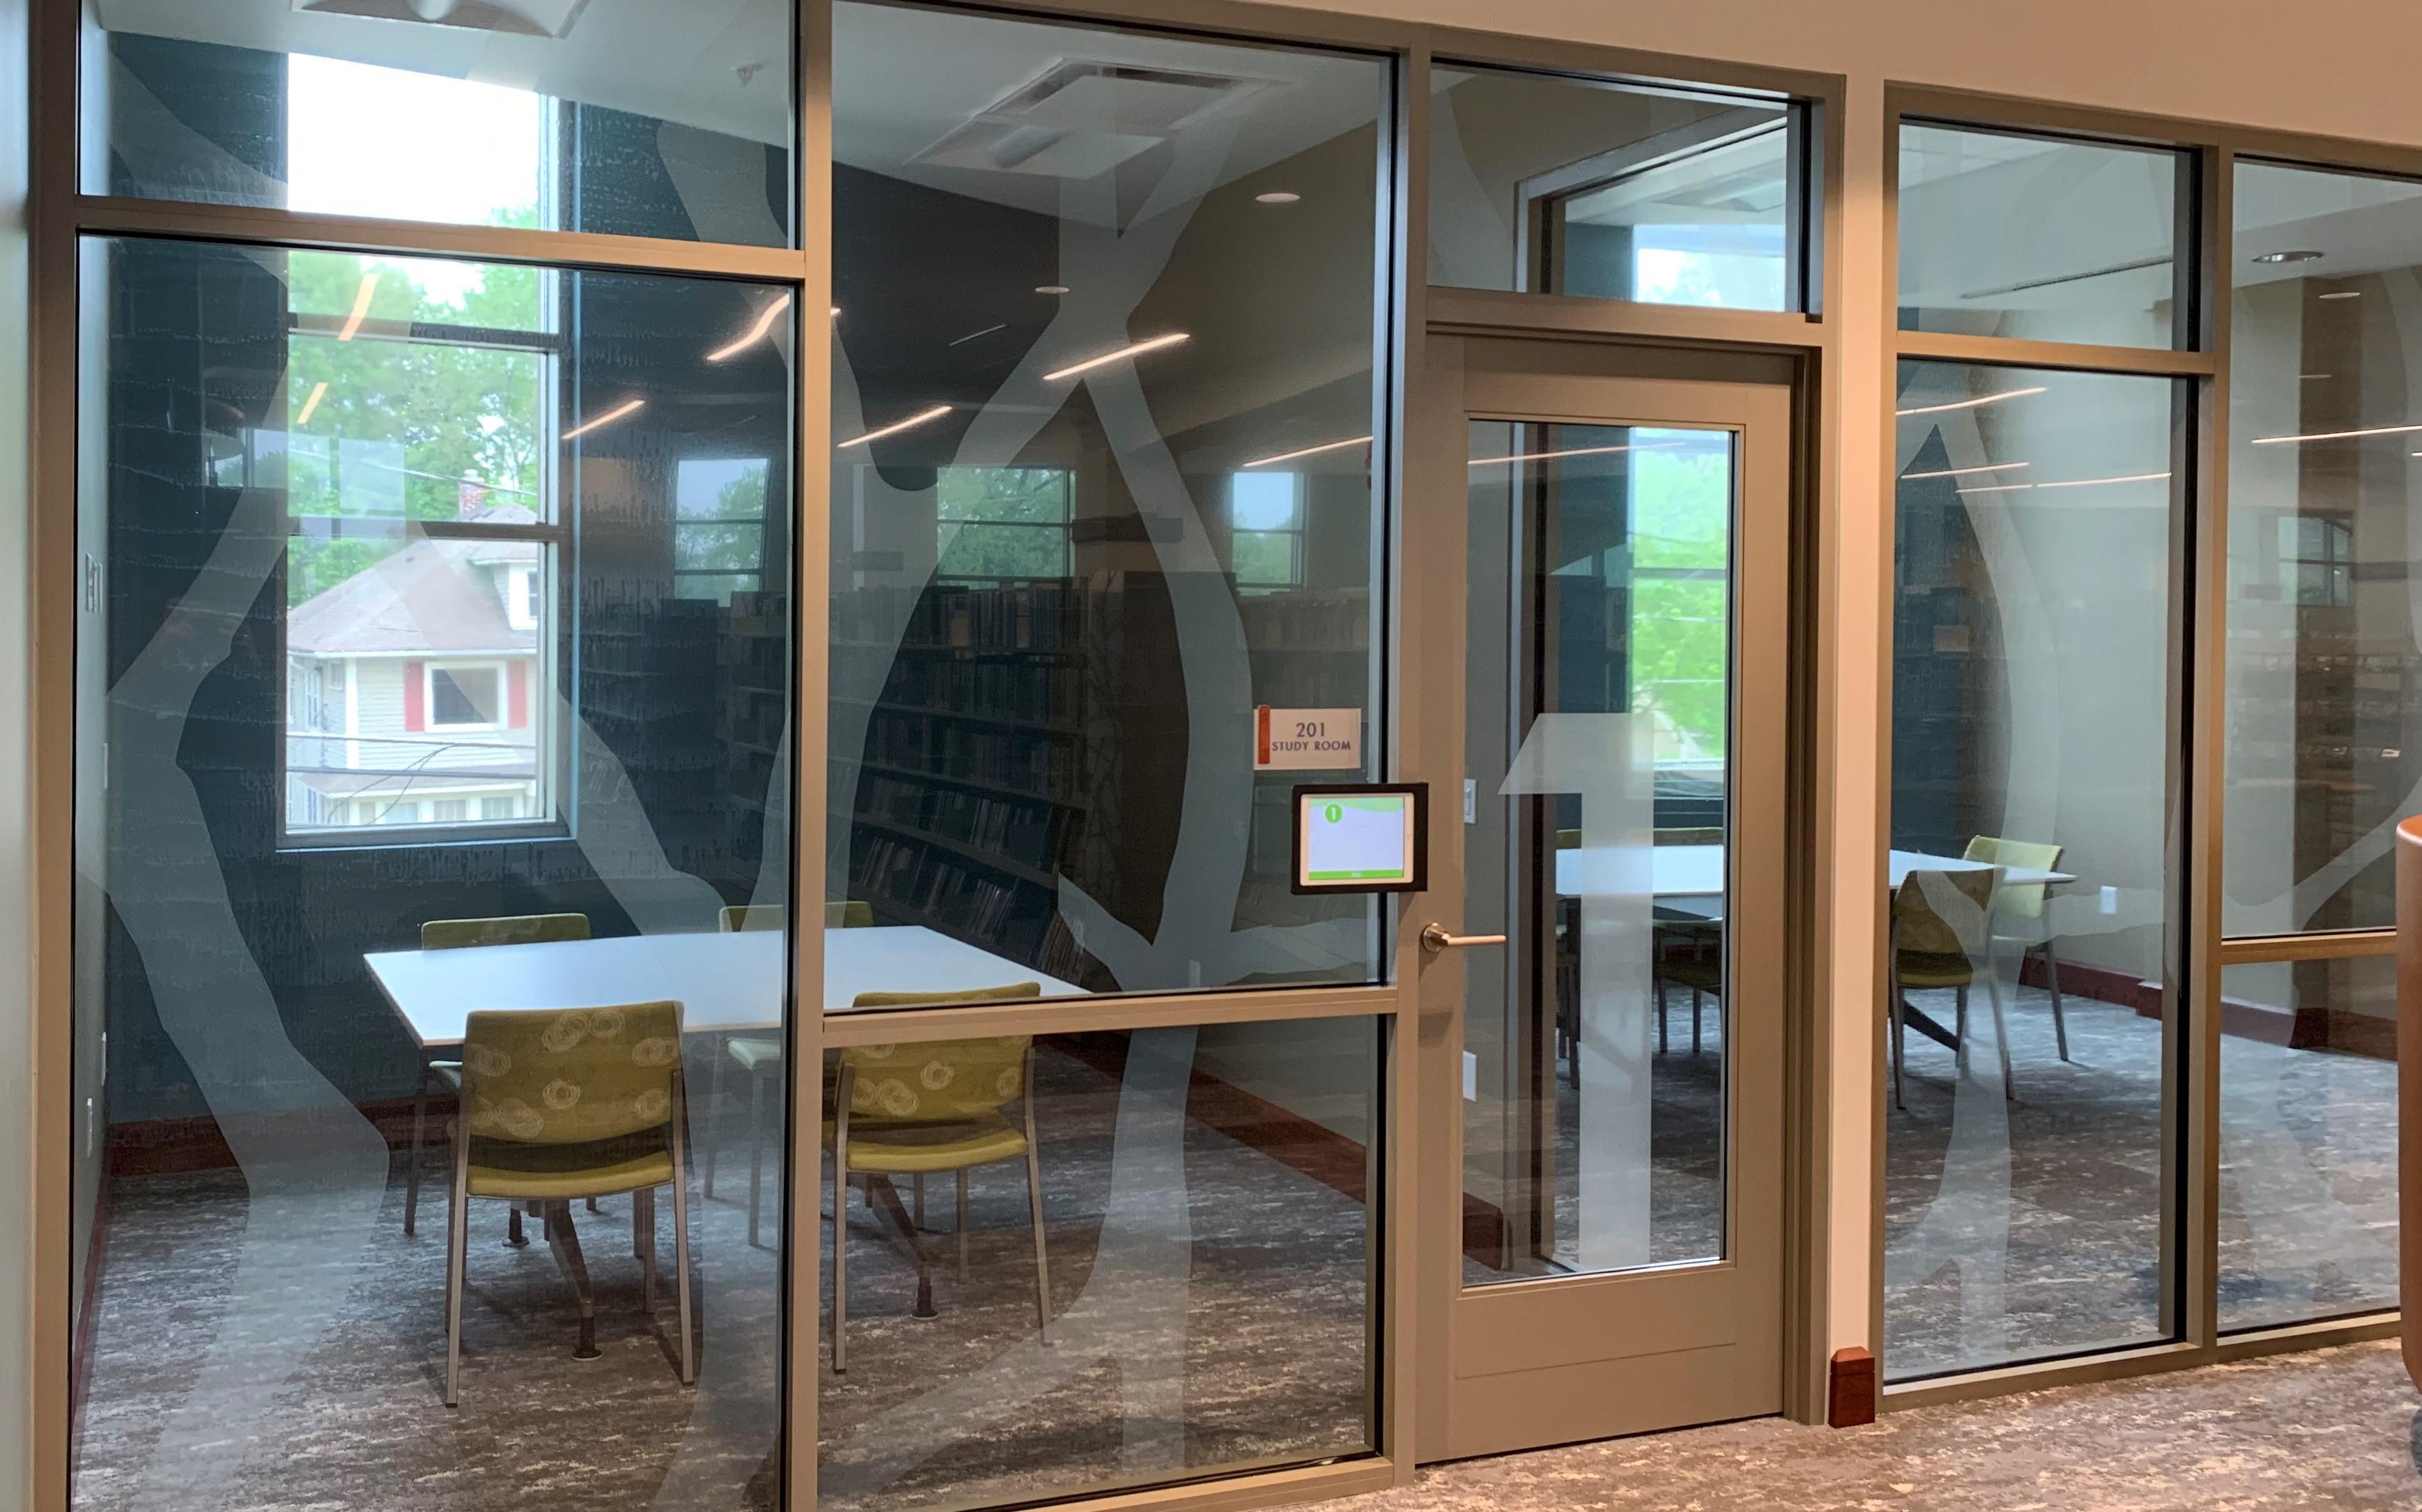 Window graphics on study room windows